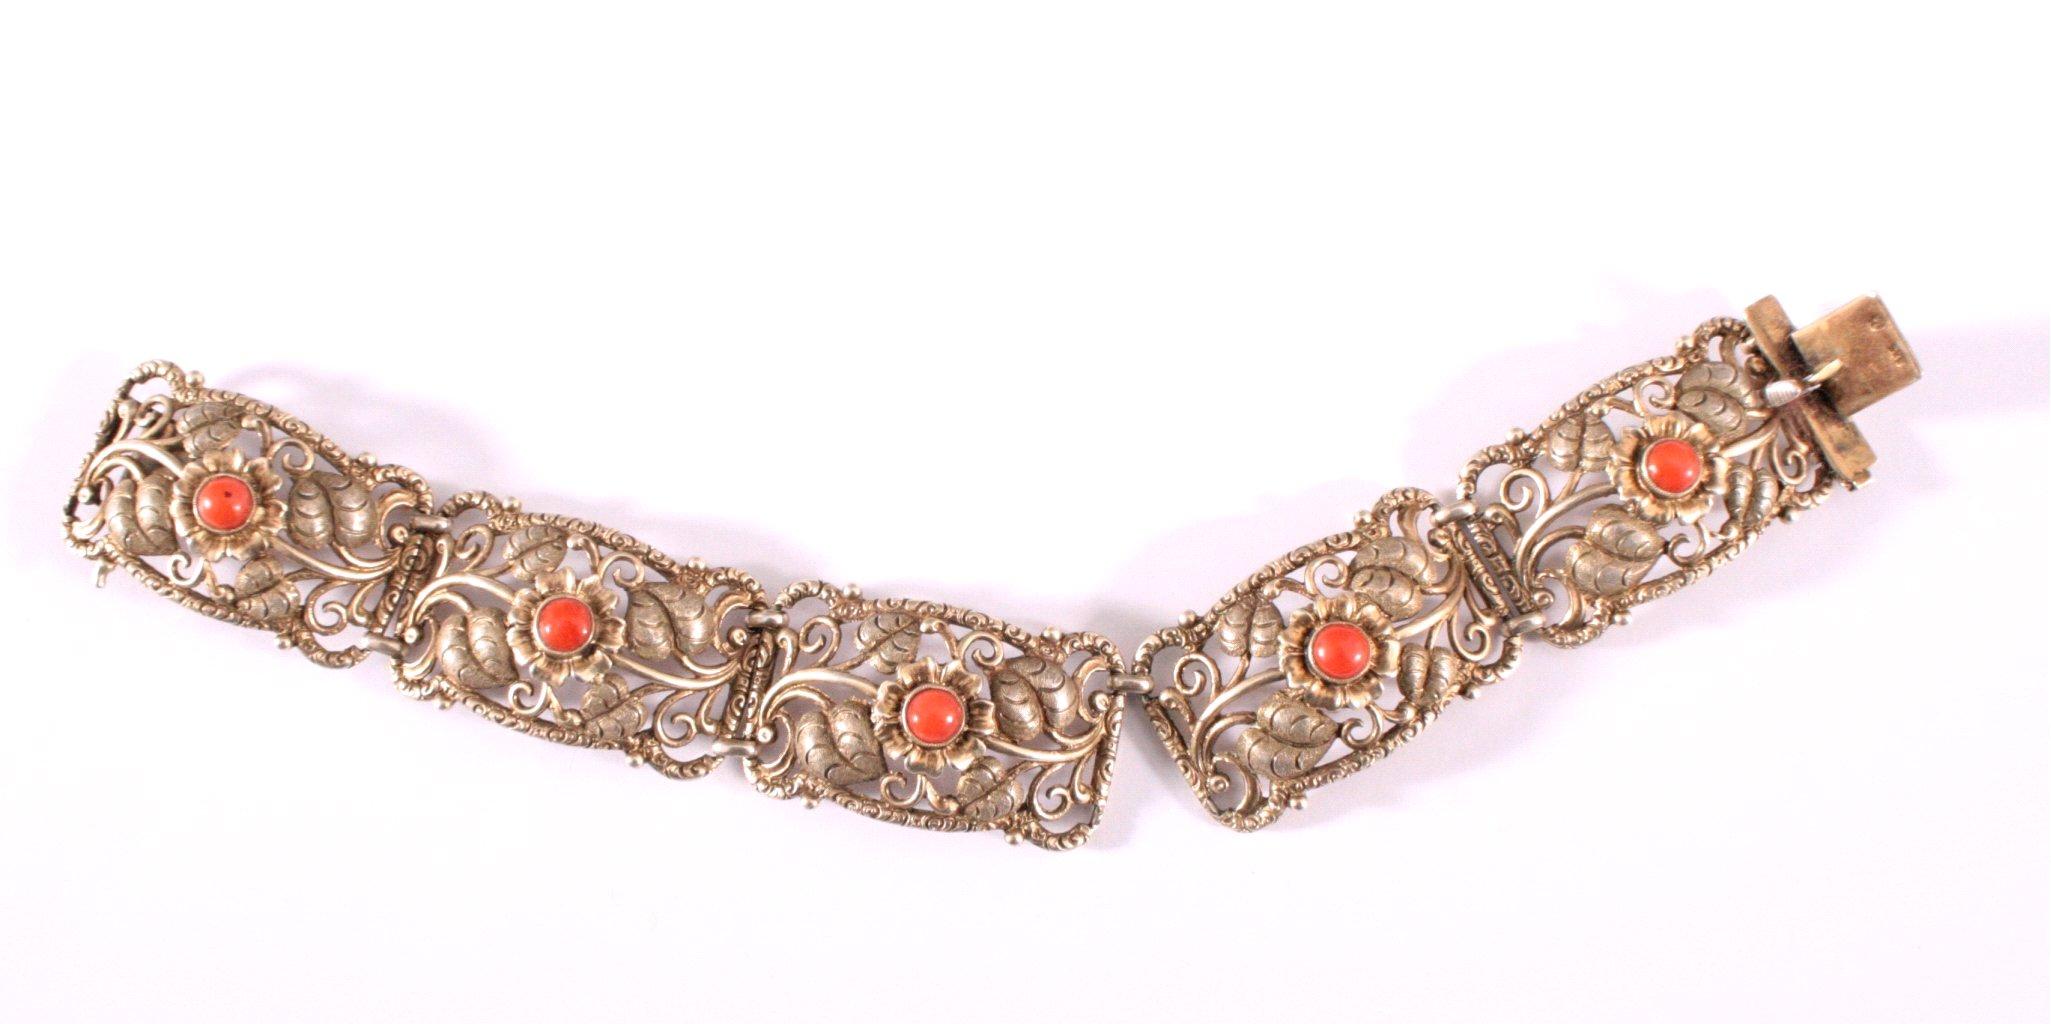 Antikes Silberarmband mit roter Koralle